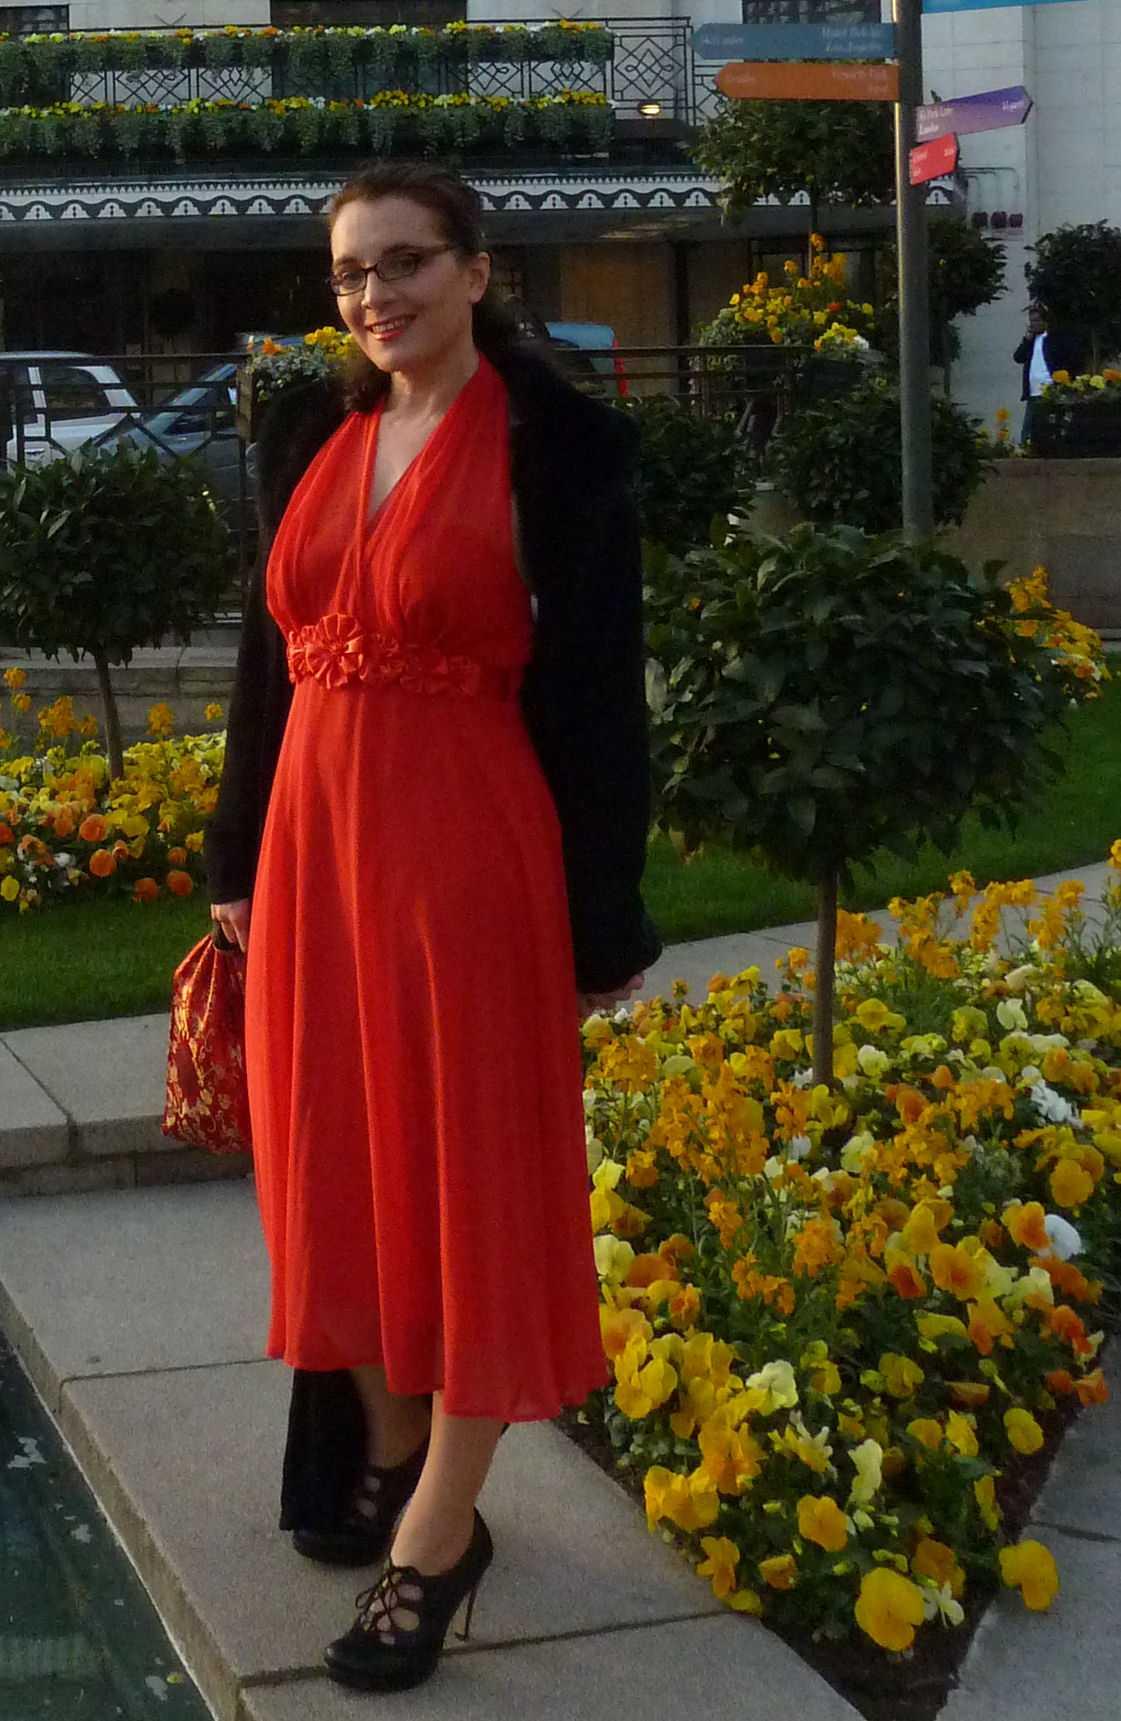 Event Companion photo Debra wearing red calf-length evening dress